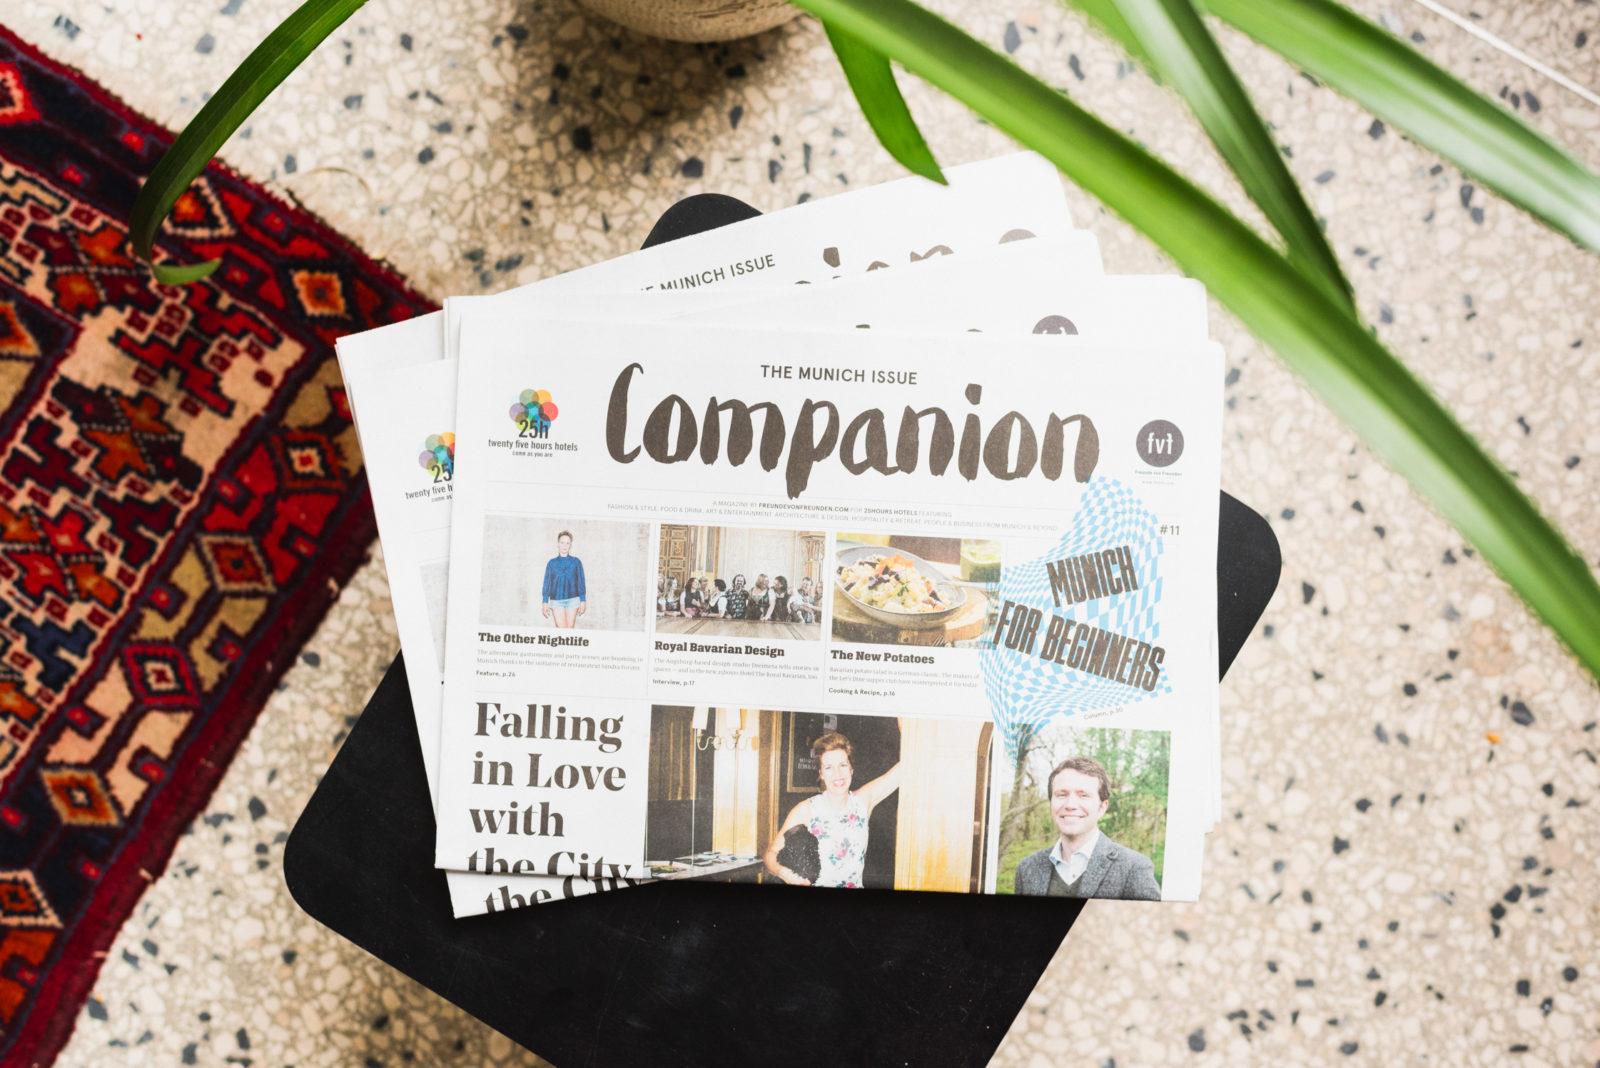 Companion Magazine  #11, Freunde von Freunden for 25hours, 2017   Translation